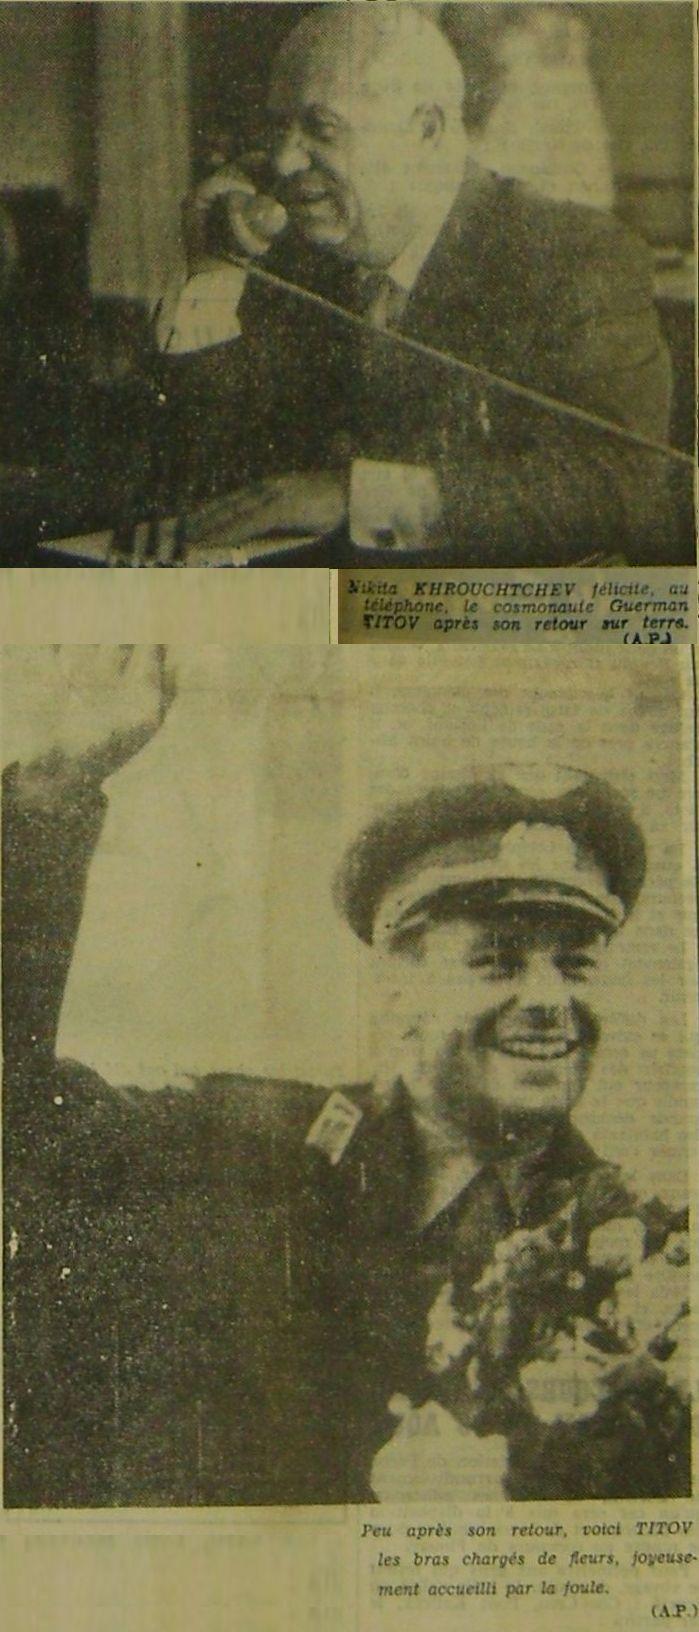 6 août 1961 - Vostok 2 - Guerman Titov 61080911